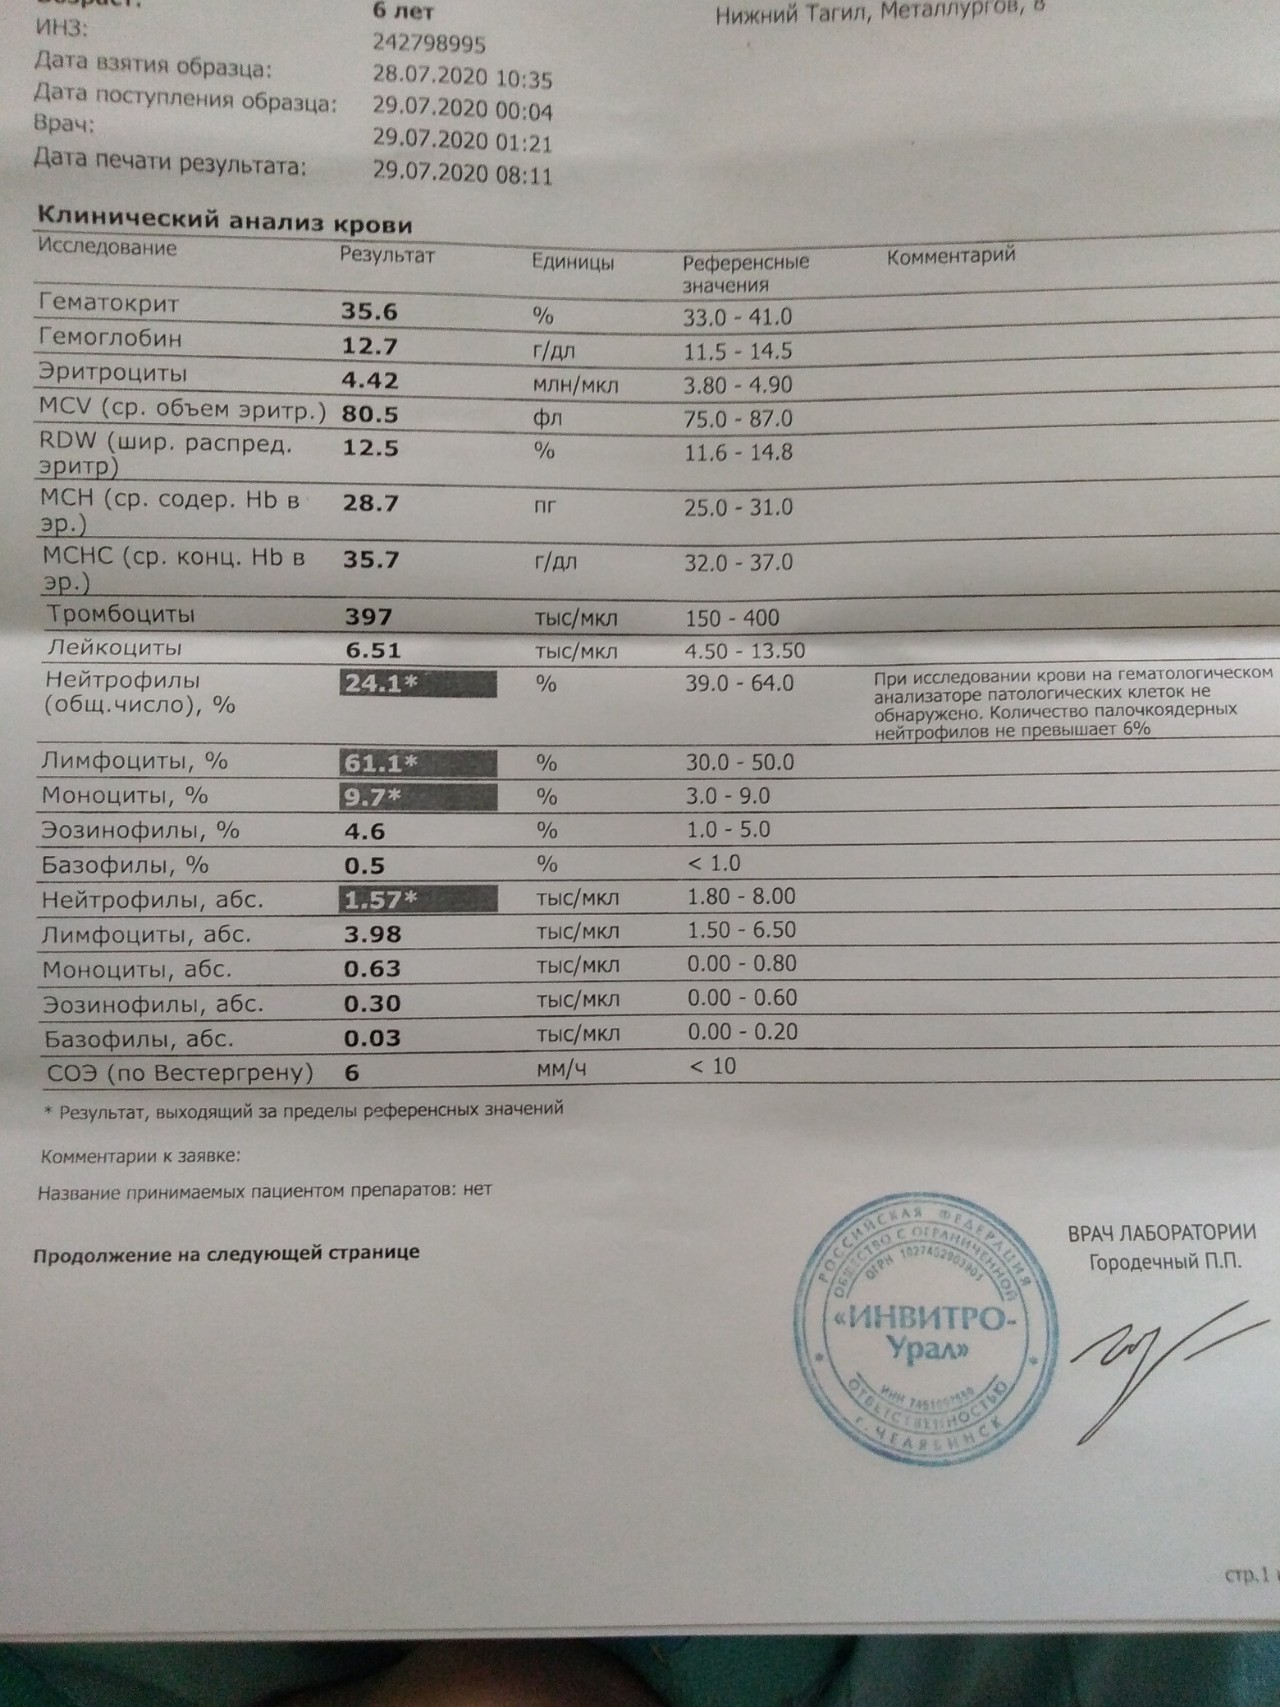 Анализ крови петербург клинический латинских крови расшифровка анализа